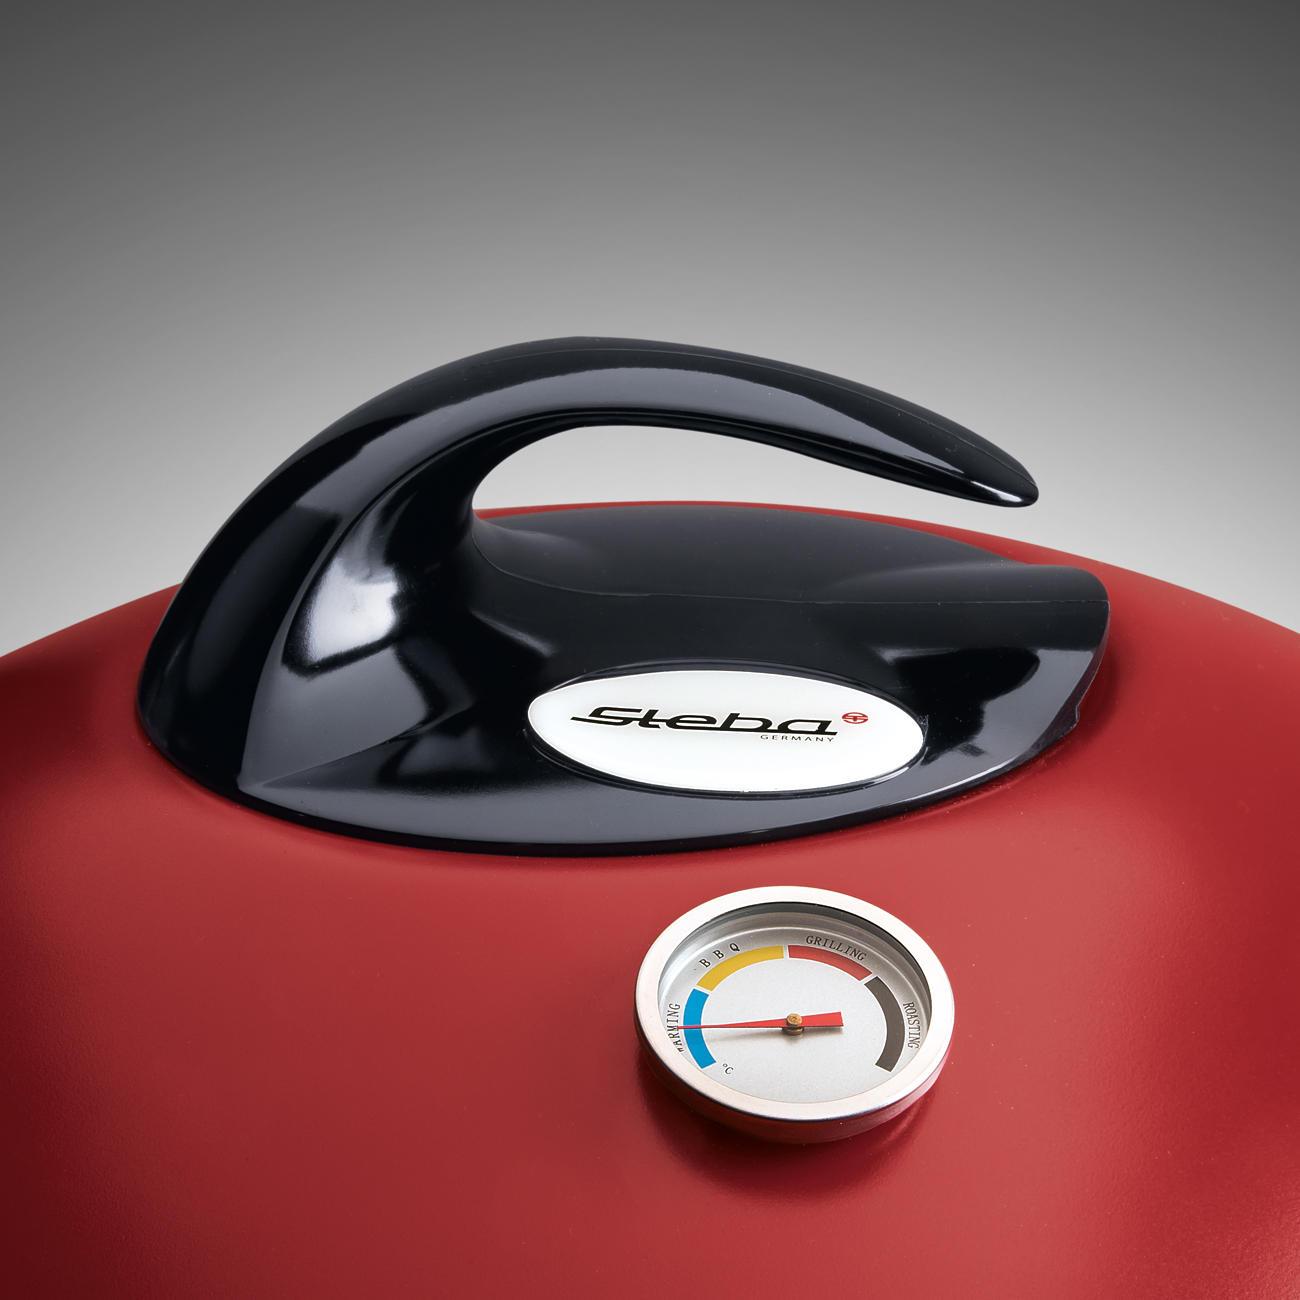 xxl barbecue elektrogrill 3 jahre garantie pro idee. Black Bedroom Furniture Sets. Home Design Ideas